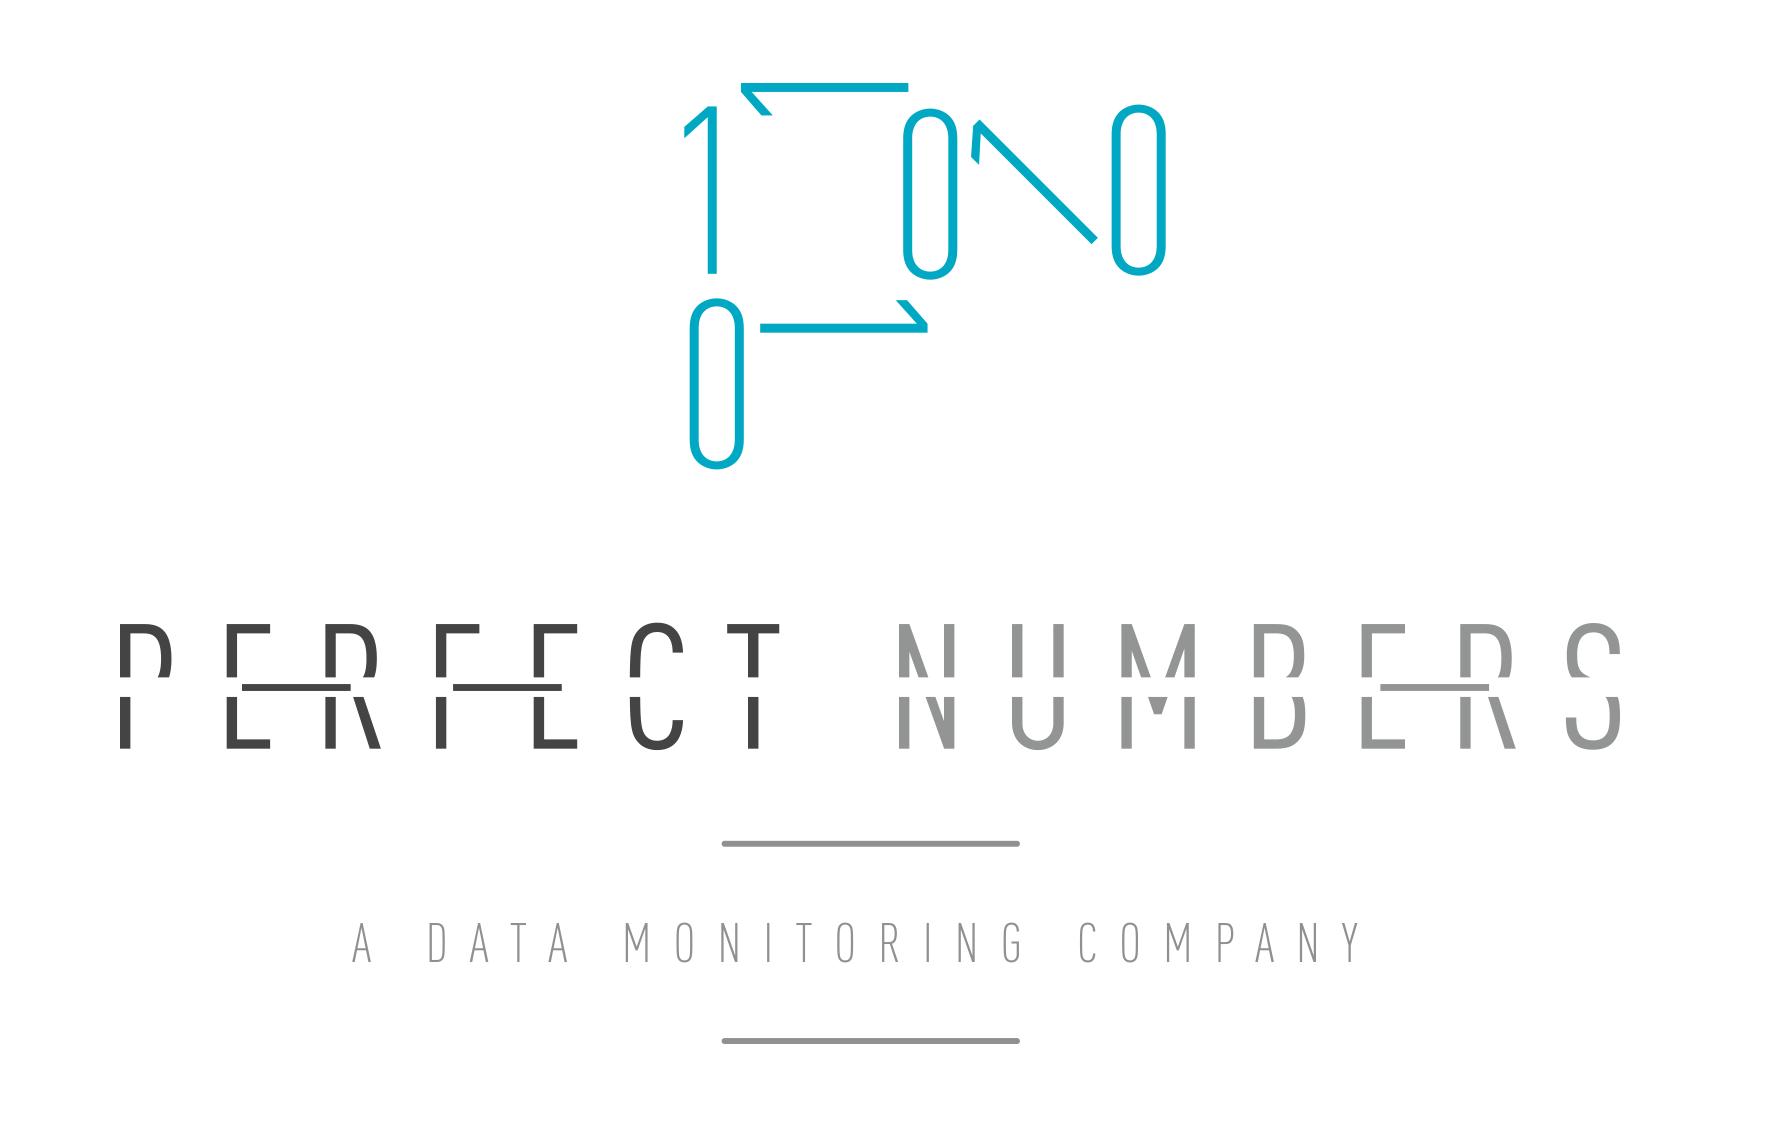 Data Monitoring, S.L.